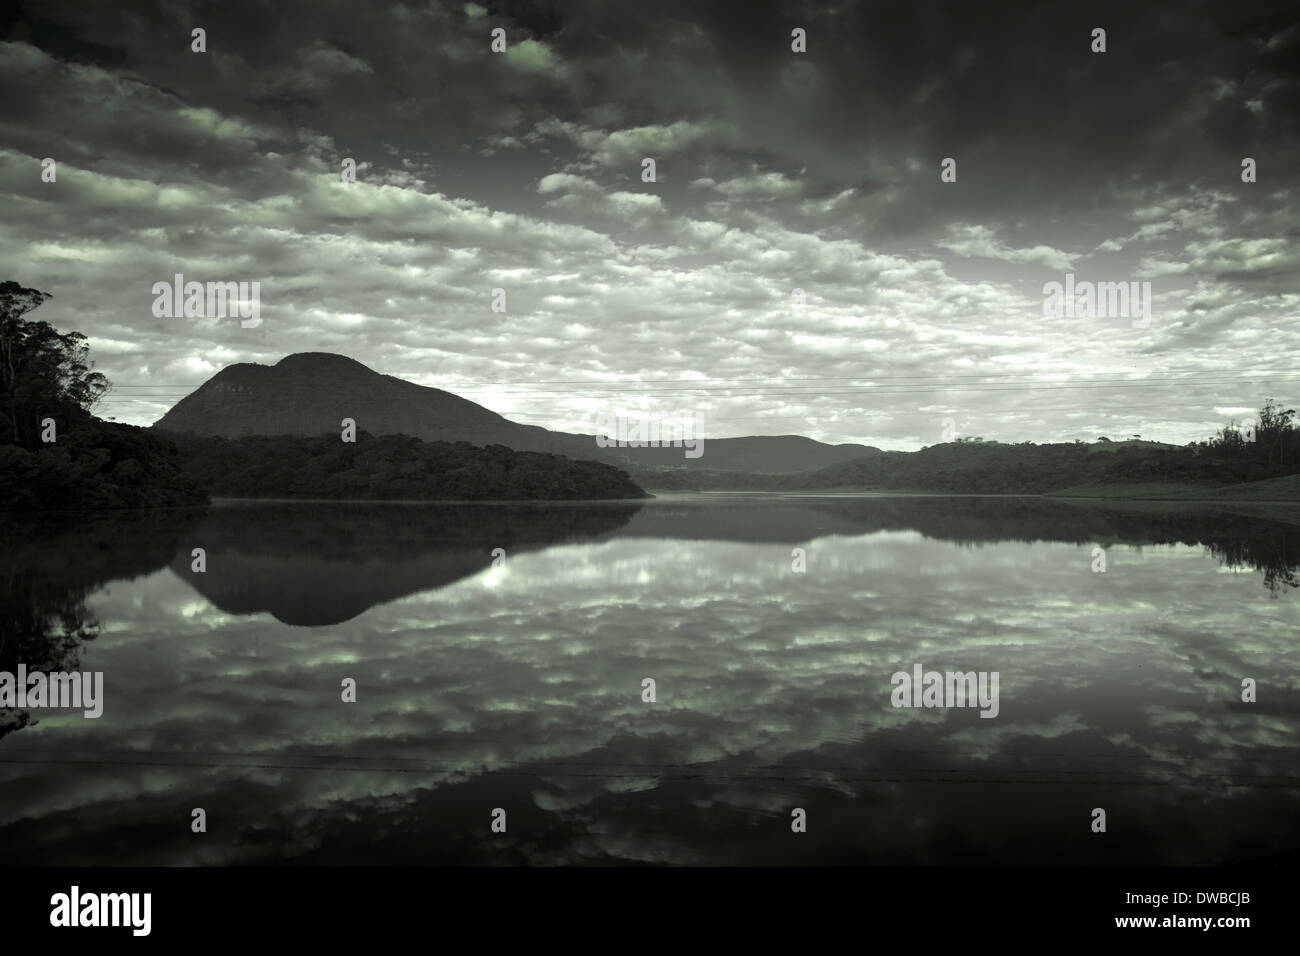 Sri Lanka, Uva, Wellawaya, freshwater lake in the evening - Stock Image